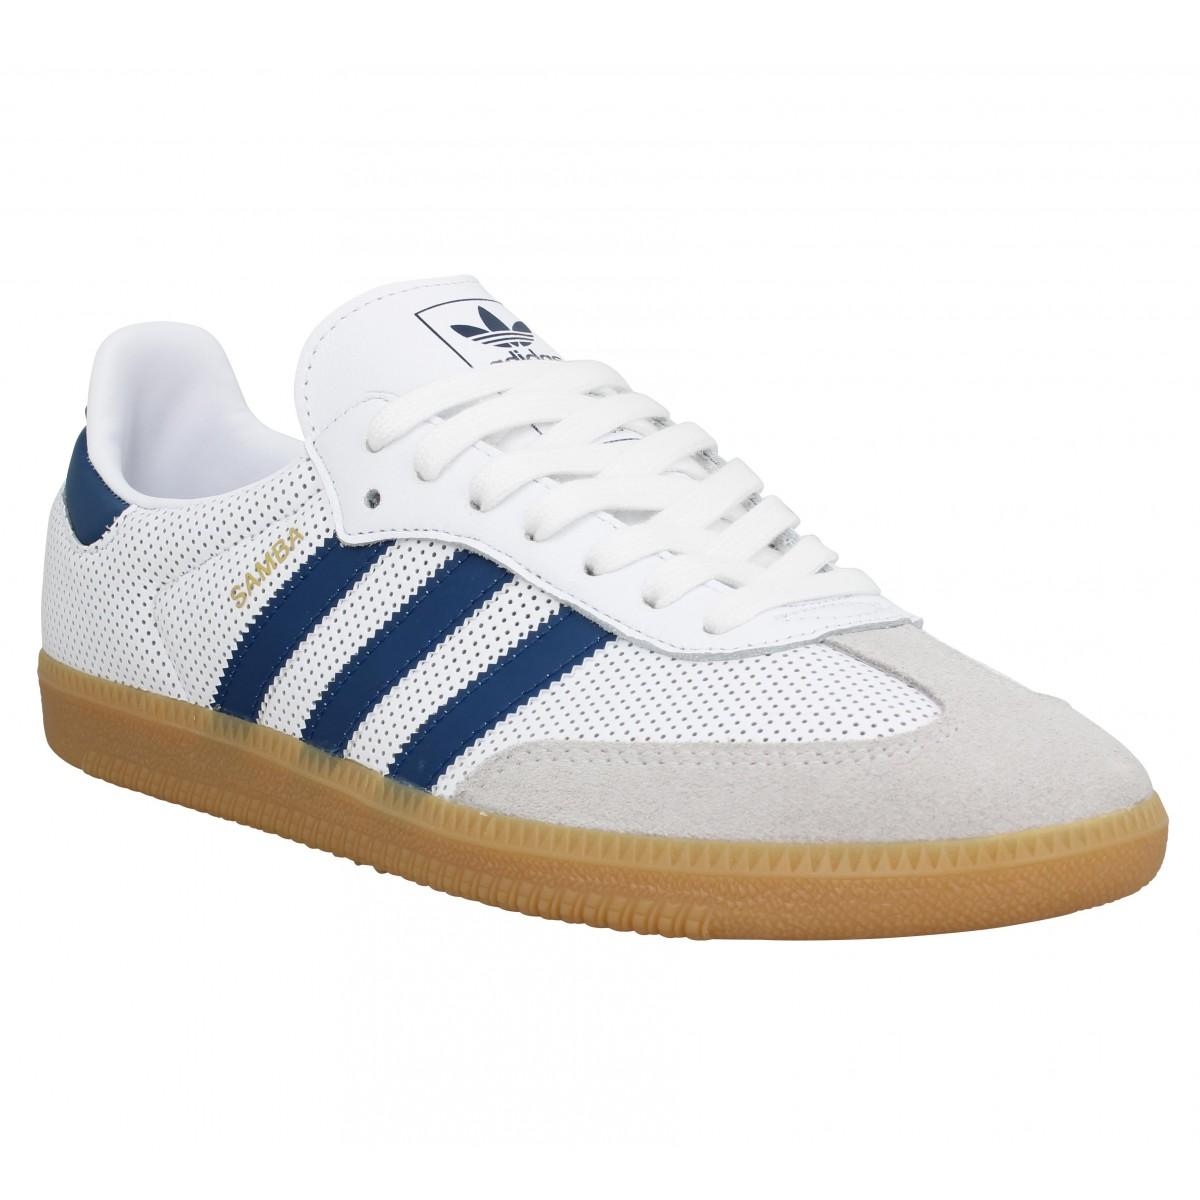 Adidas Homme Samba Og Cuir -40-blanc...